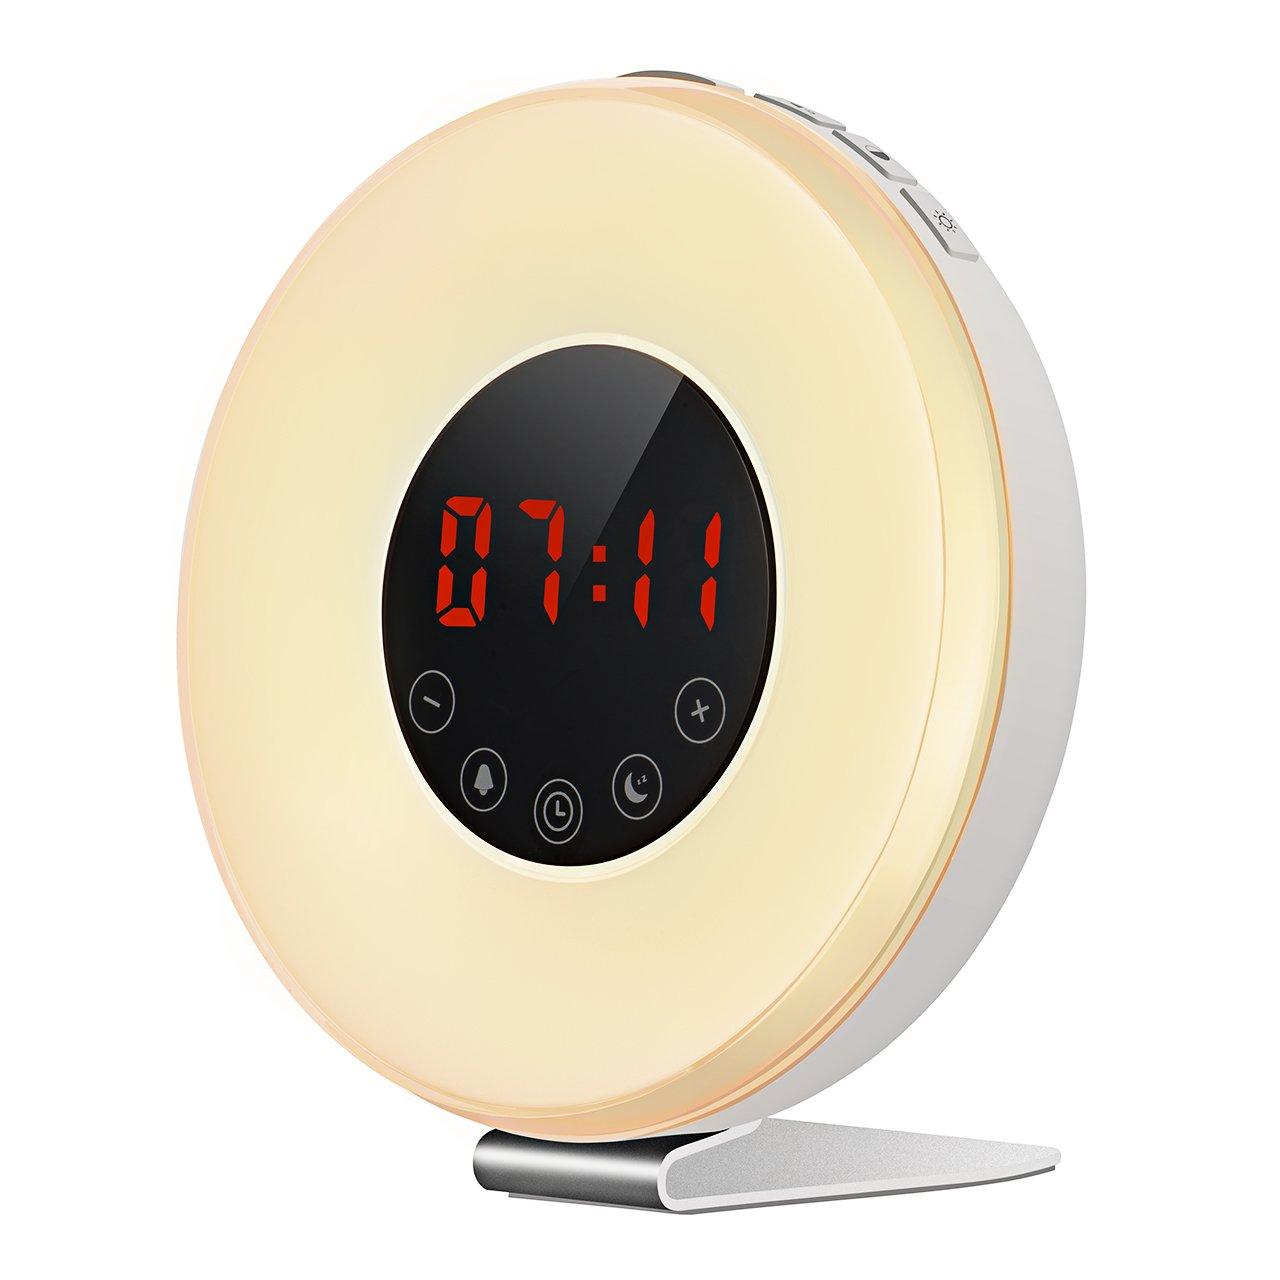 TOPELEK Projection Clock, 5'' Curved-Screen FM Radio Alarm Clock with Adjustable Dimmer, Digital Alarm Clock with Multiple Alarm Voice, Dual Alarm, Snooze Mode, Sleep Timer, USB Charging Port, Blue